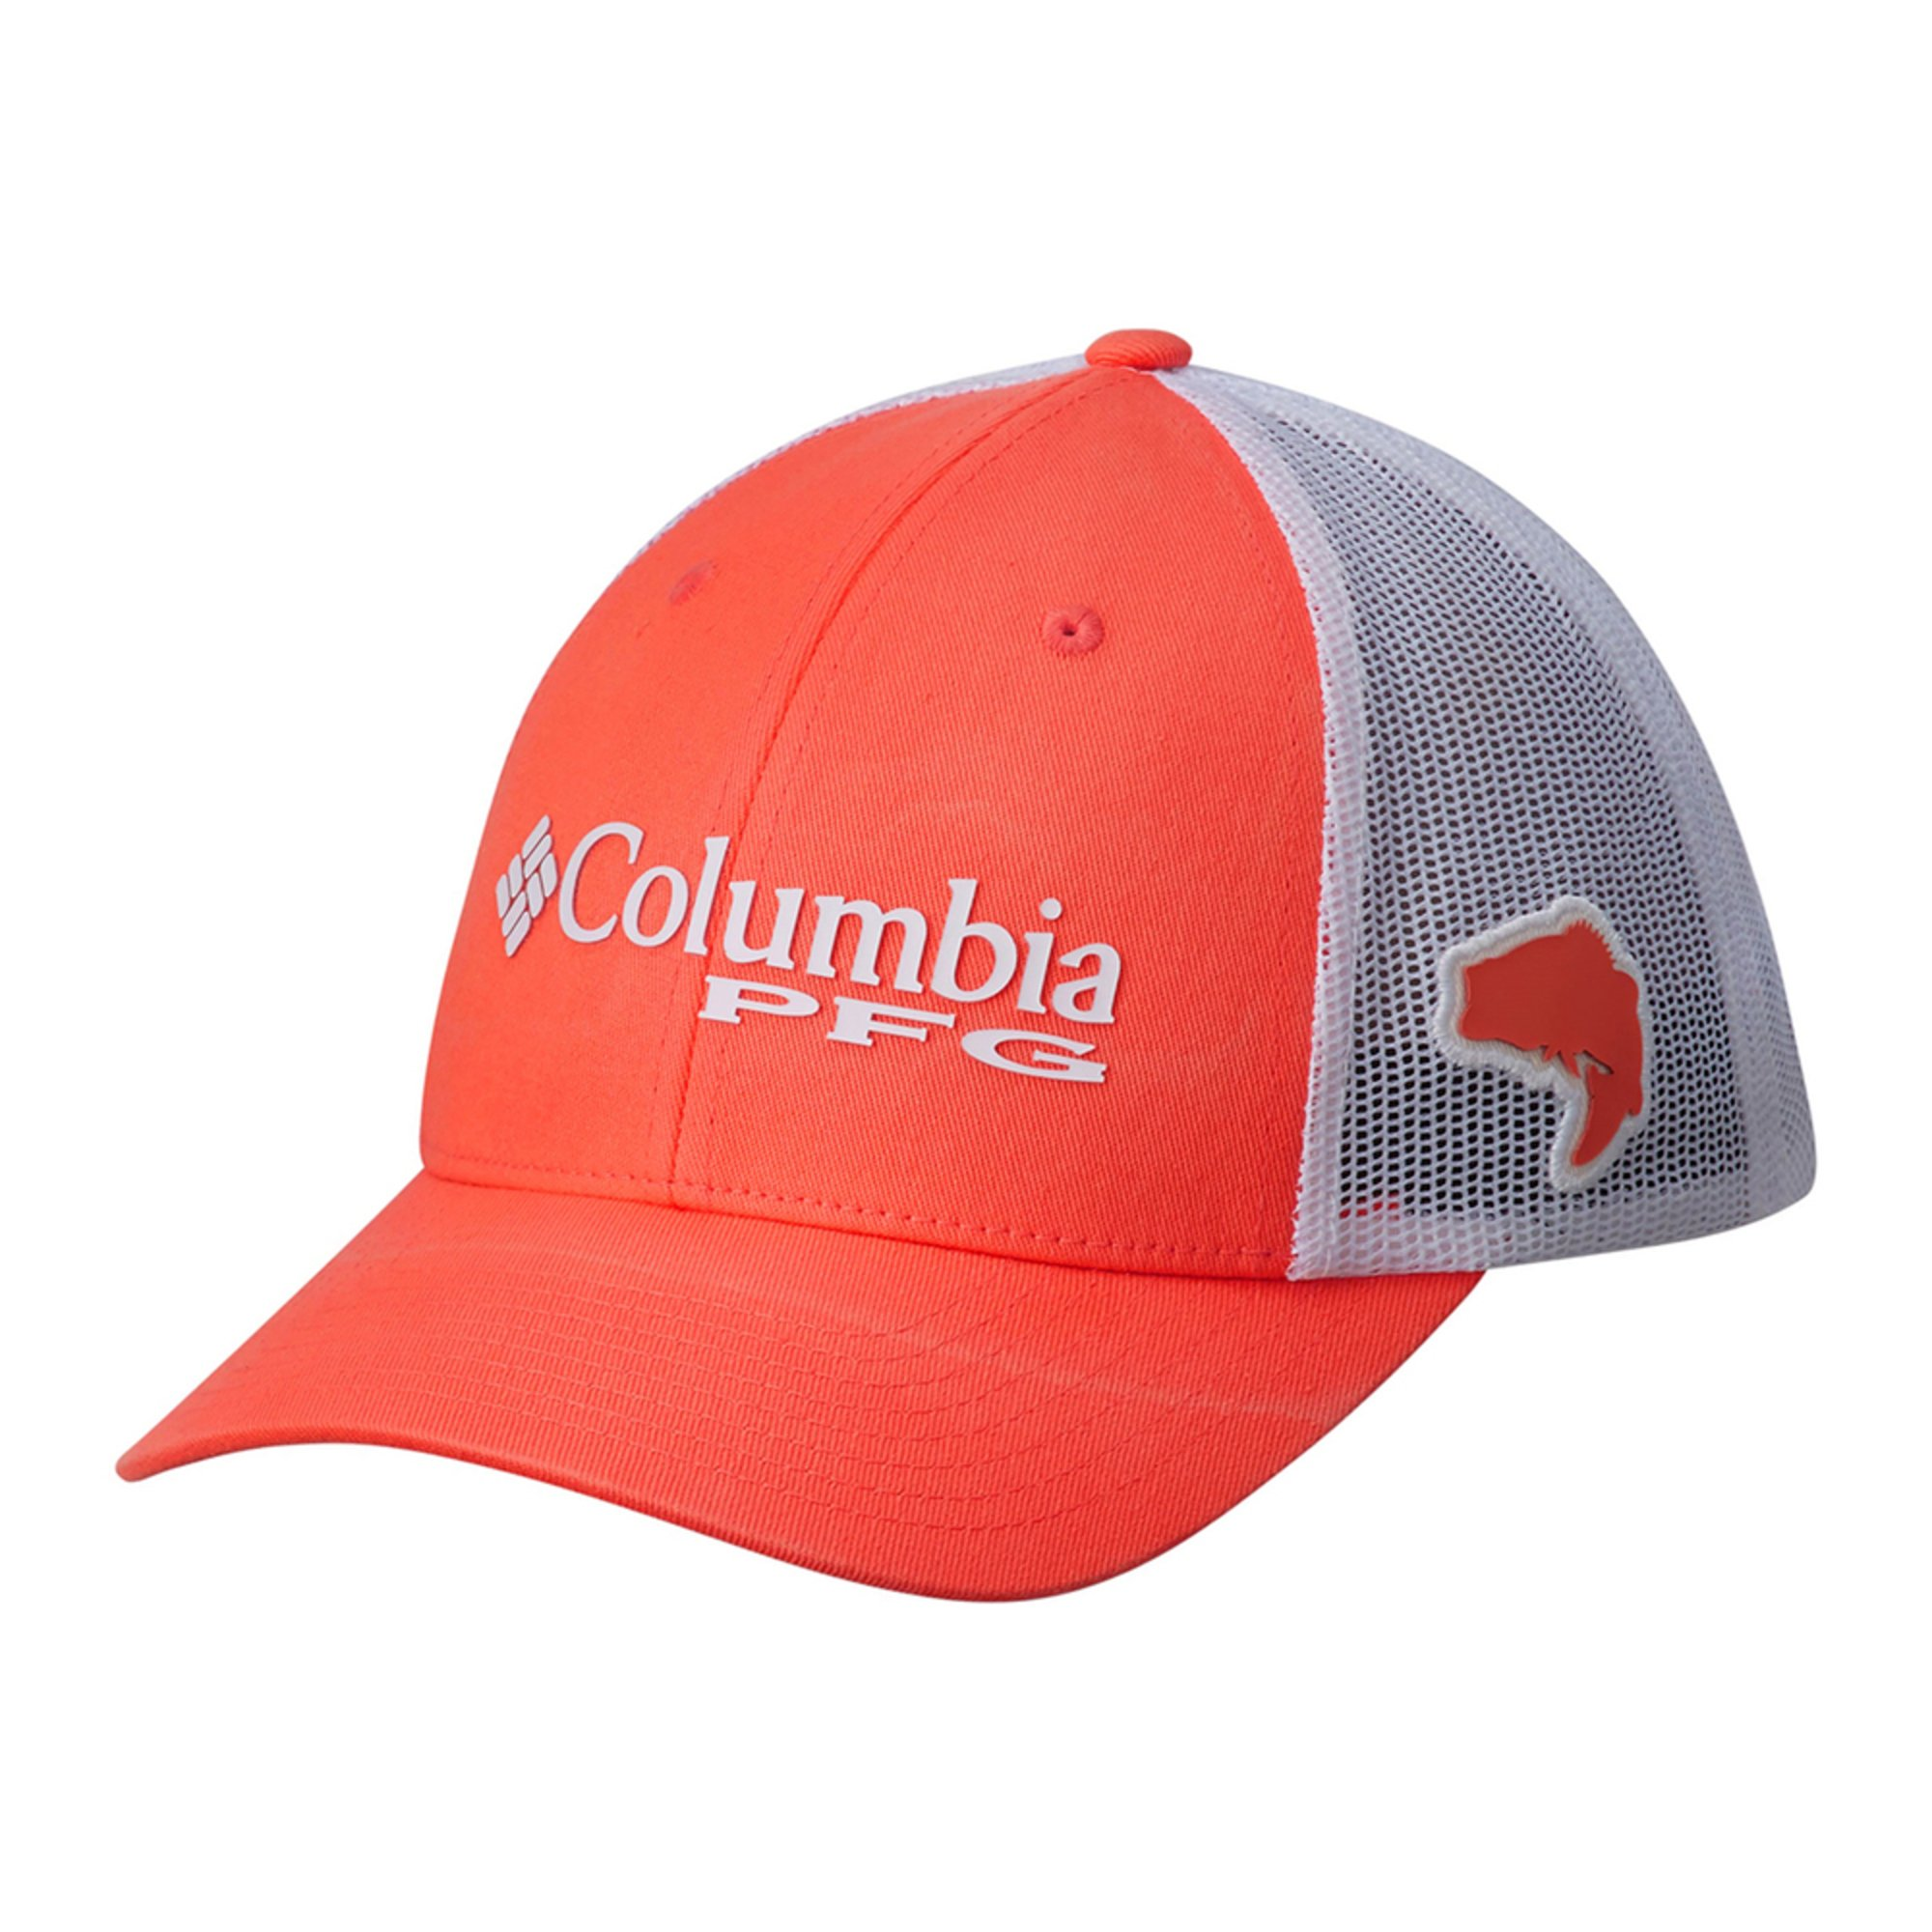 b2a339f00da9f Columbia Mesh Snap Back Ball Cap